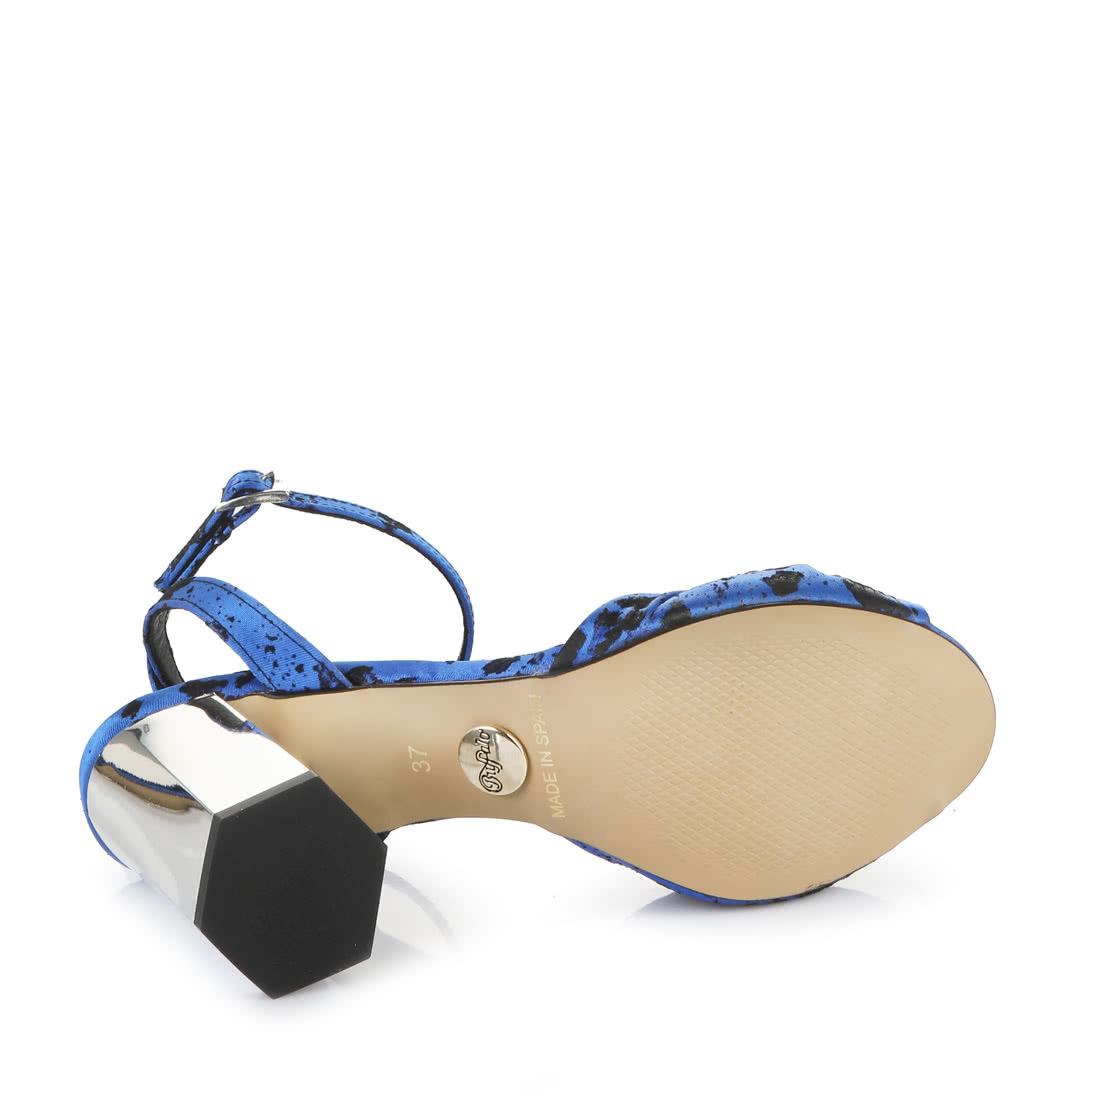 Buffalo Sandales Bleues LigneBuffalo® Talon Acheter En À UzVqMGSp